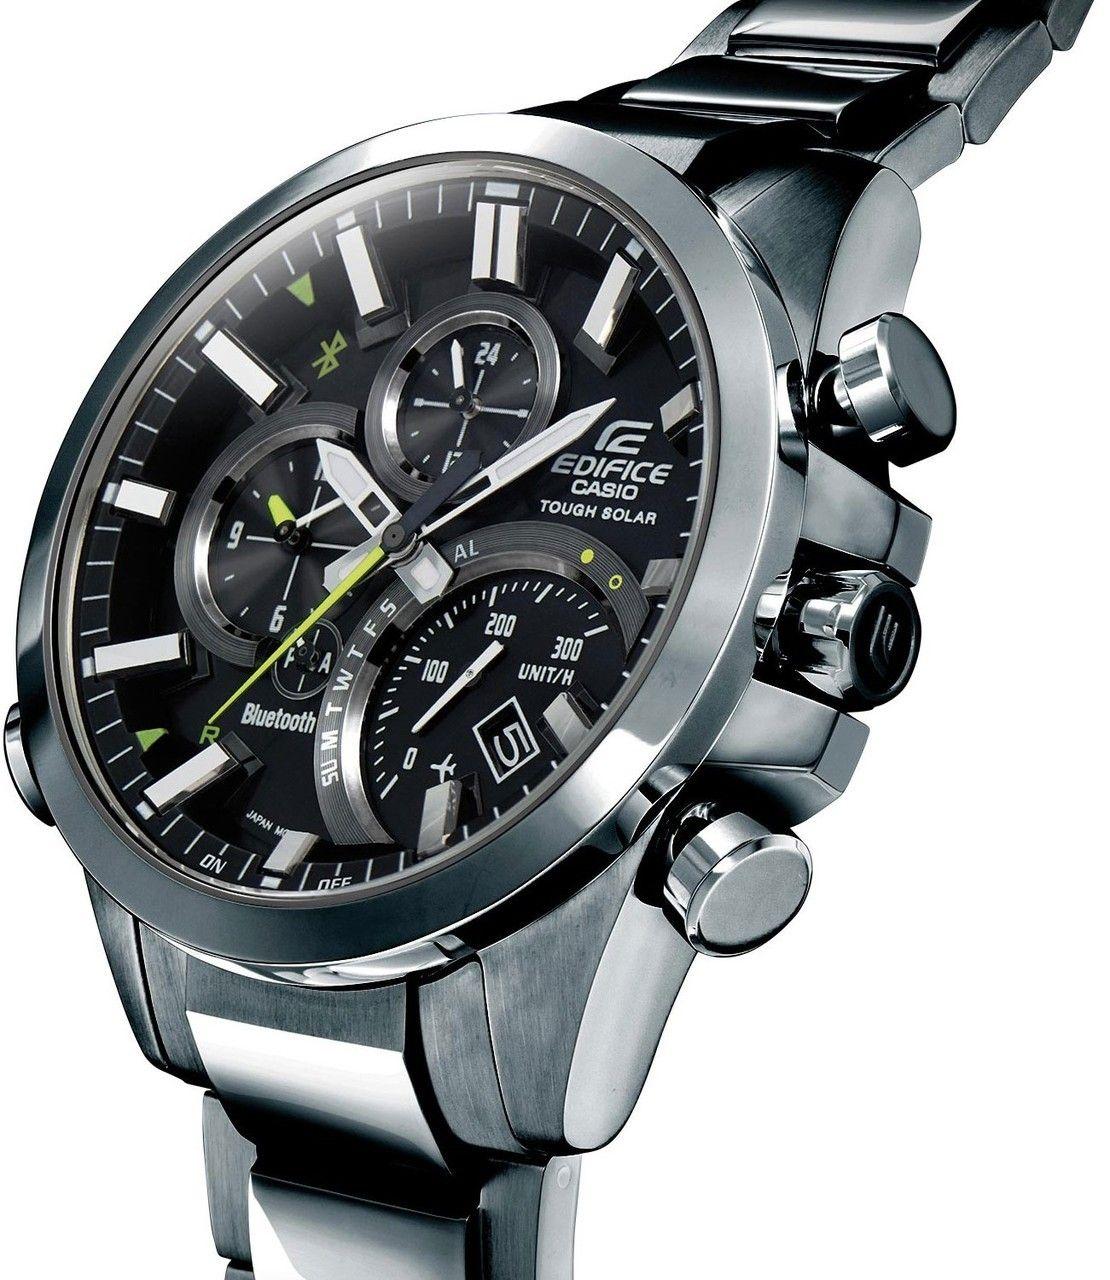 dd72ffc375e6 Casio Edifice Analogue Bluetooth Watch Tough Solar Chronograph Black ...